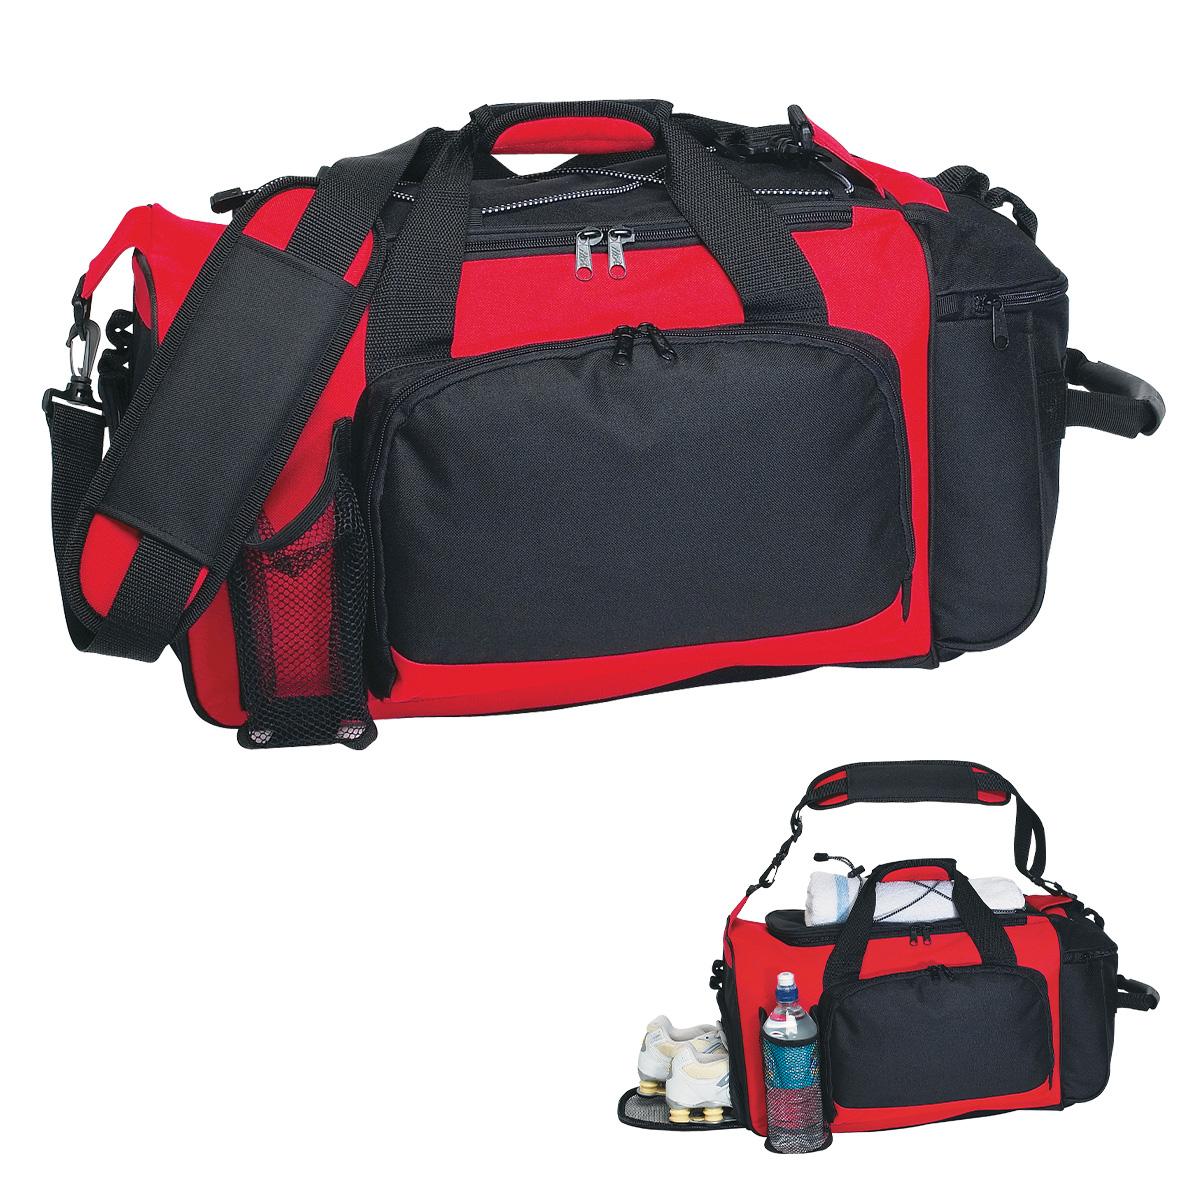 #3111 Deluxe Sports Duffel Bag